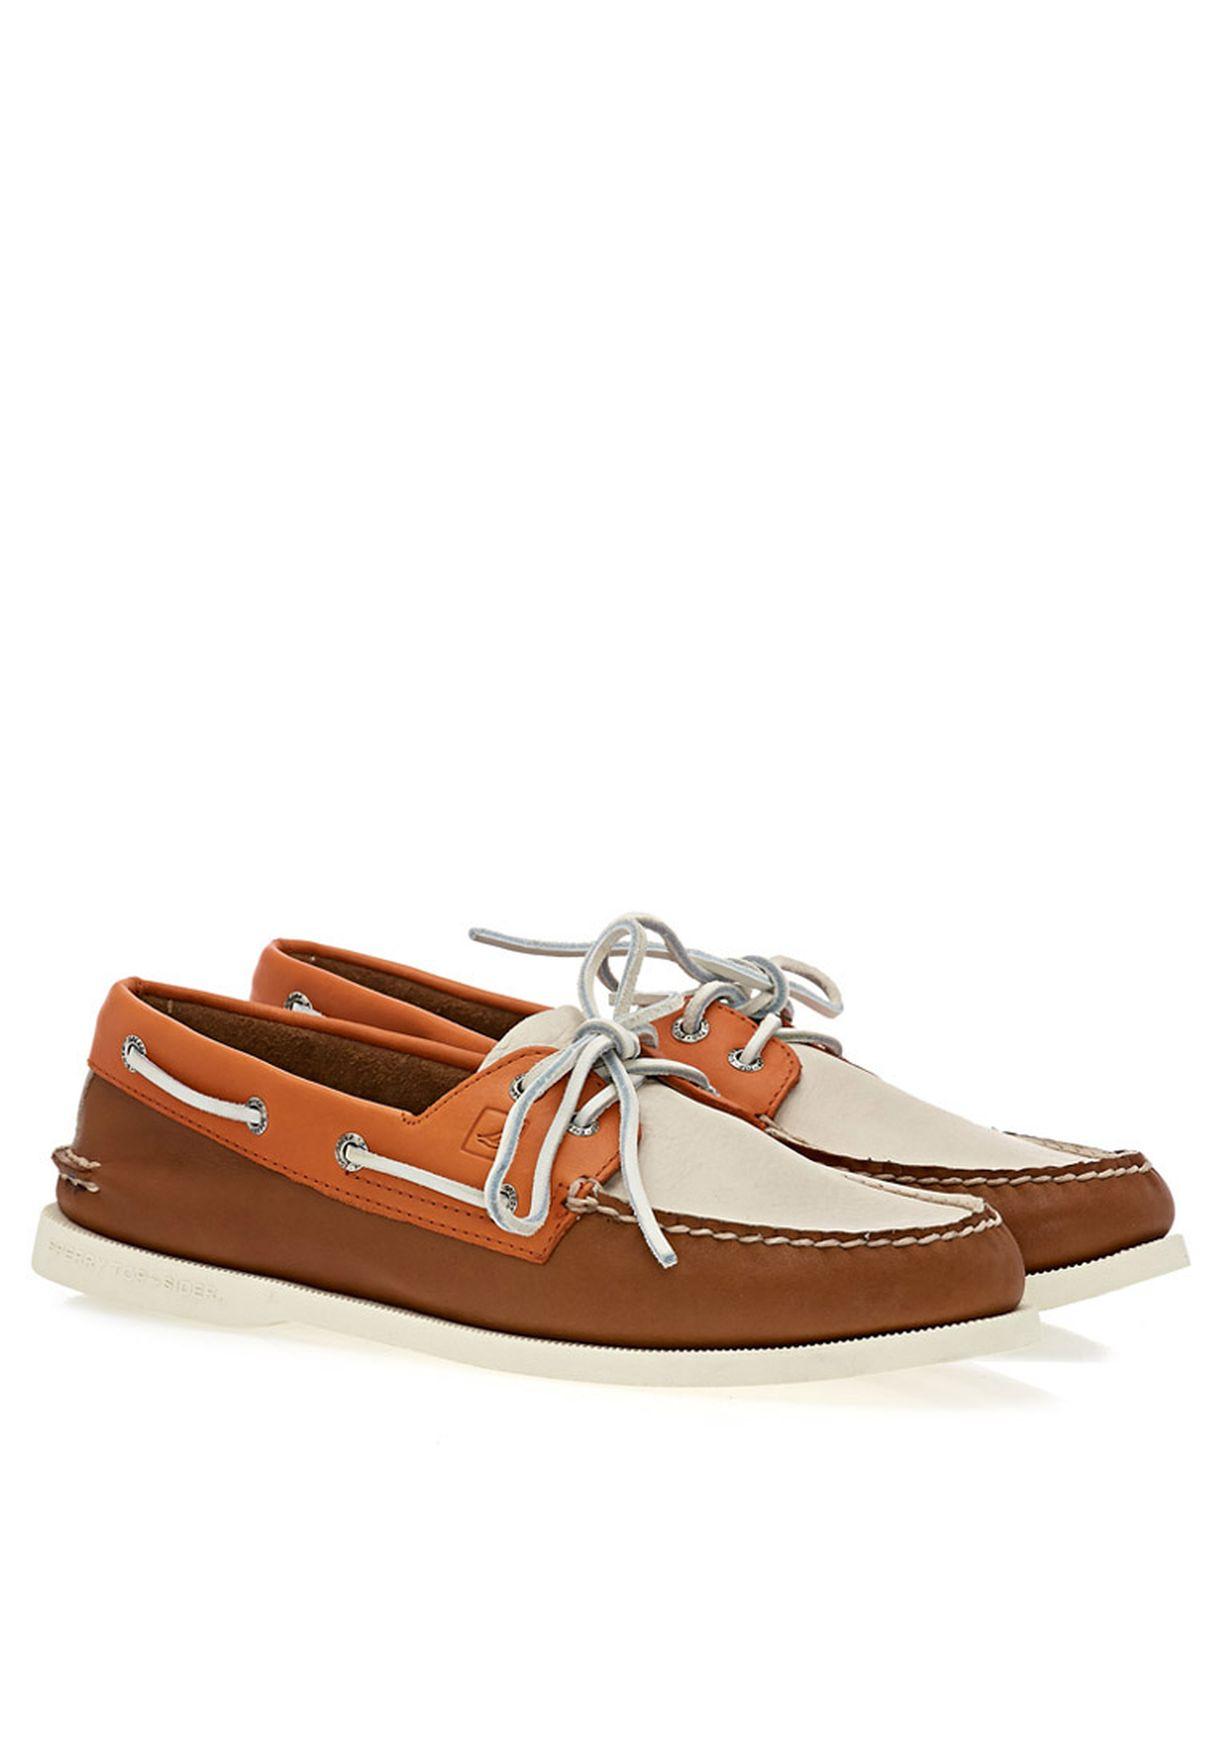 Buy multicolor Boat Shoes for Men in